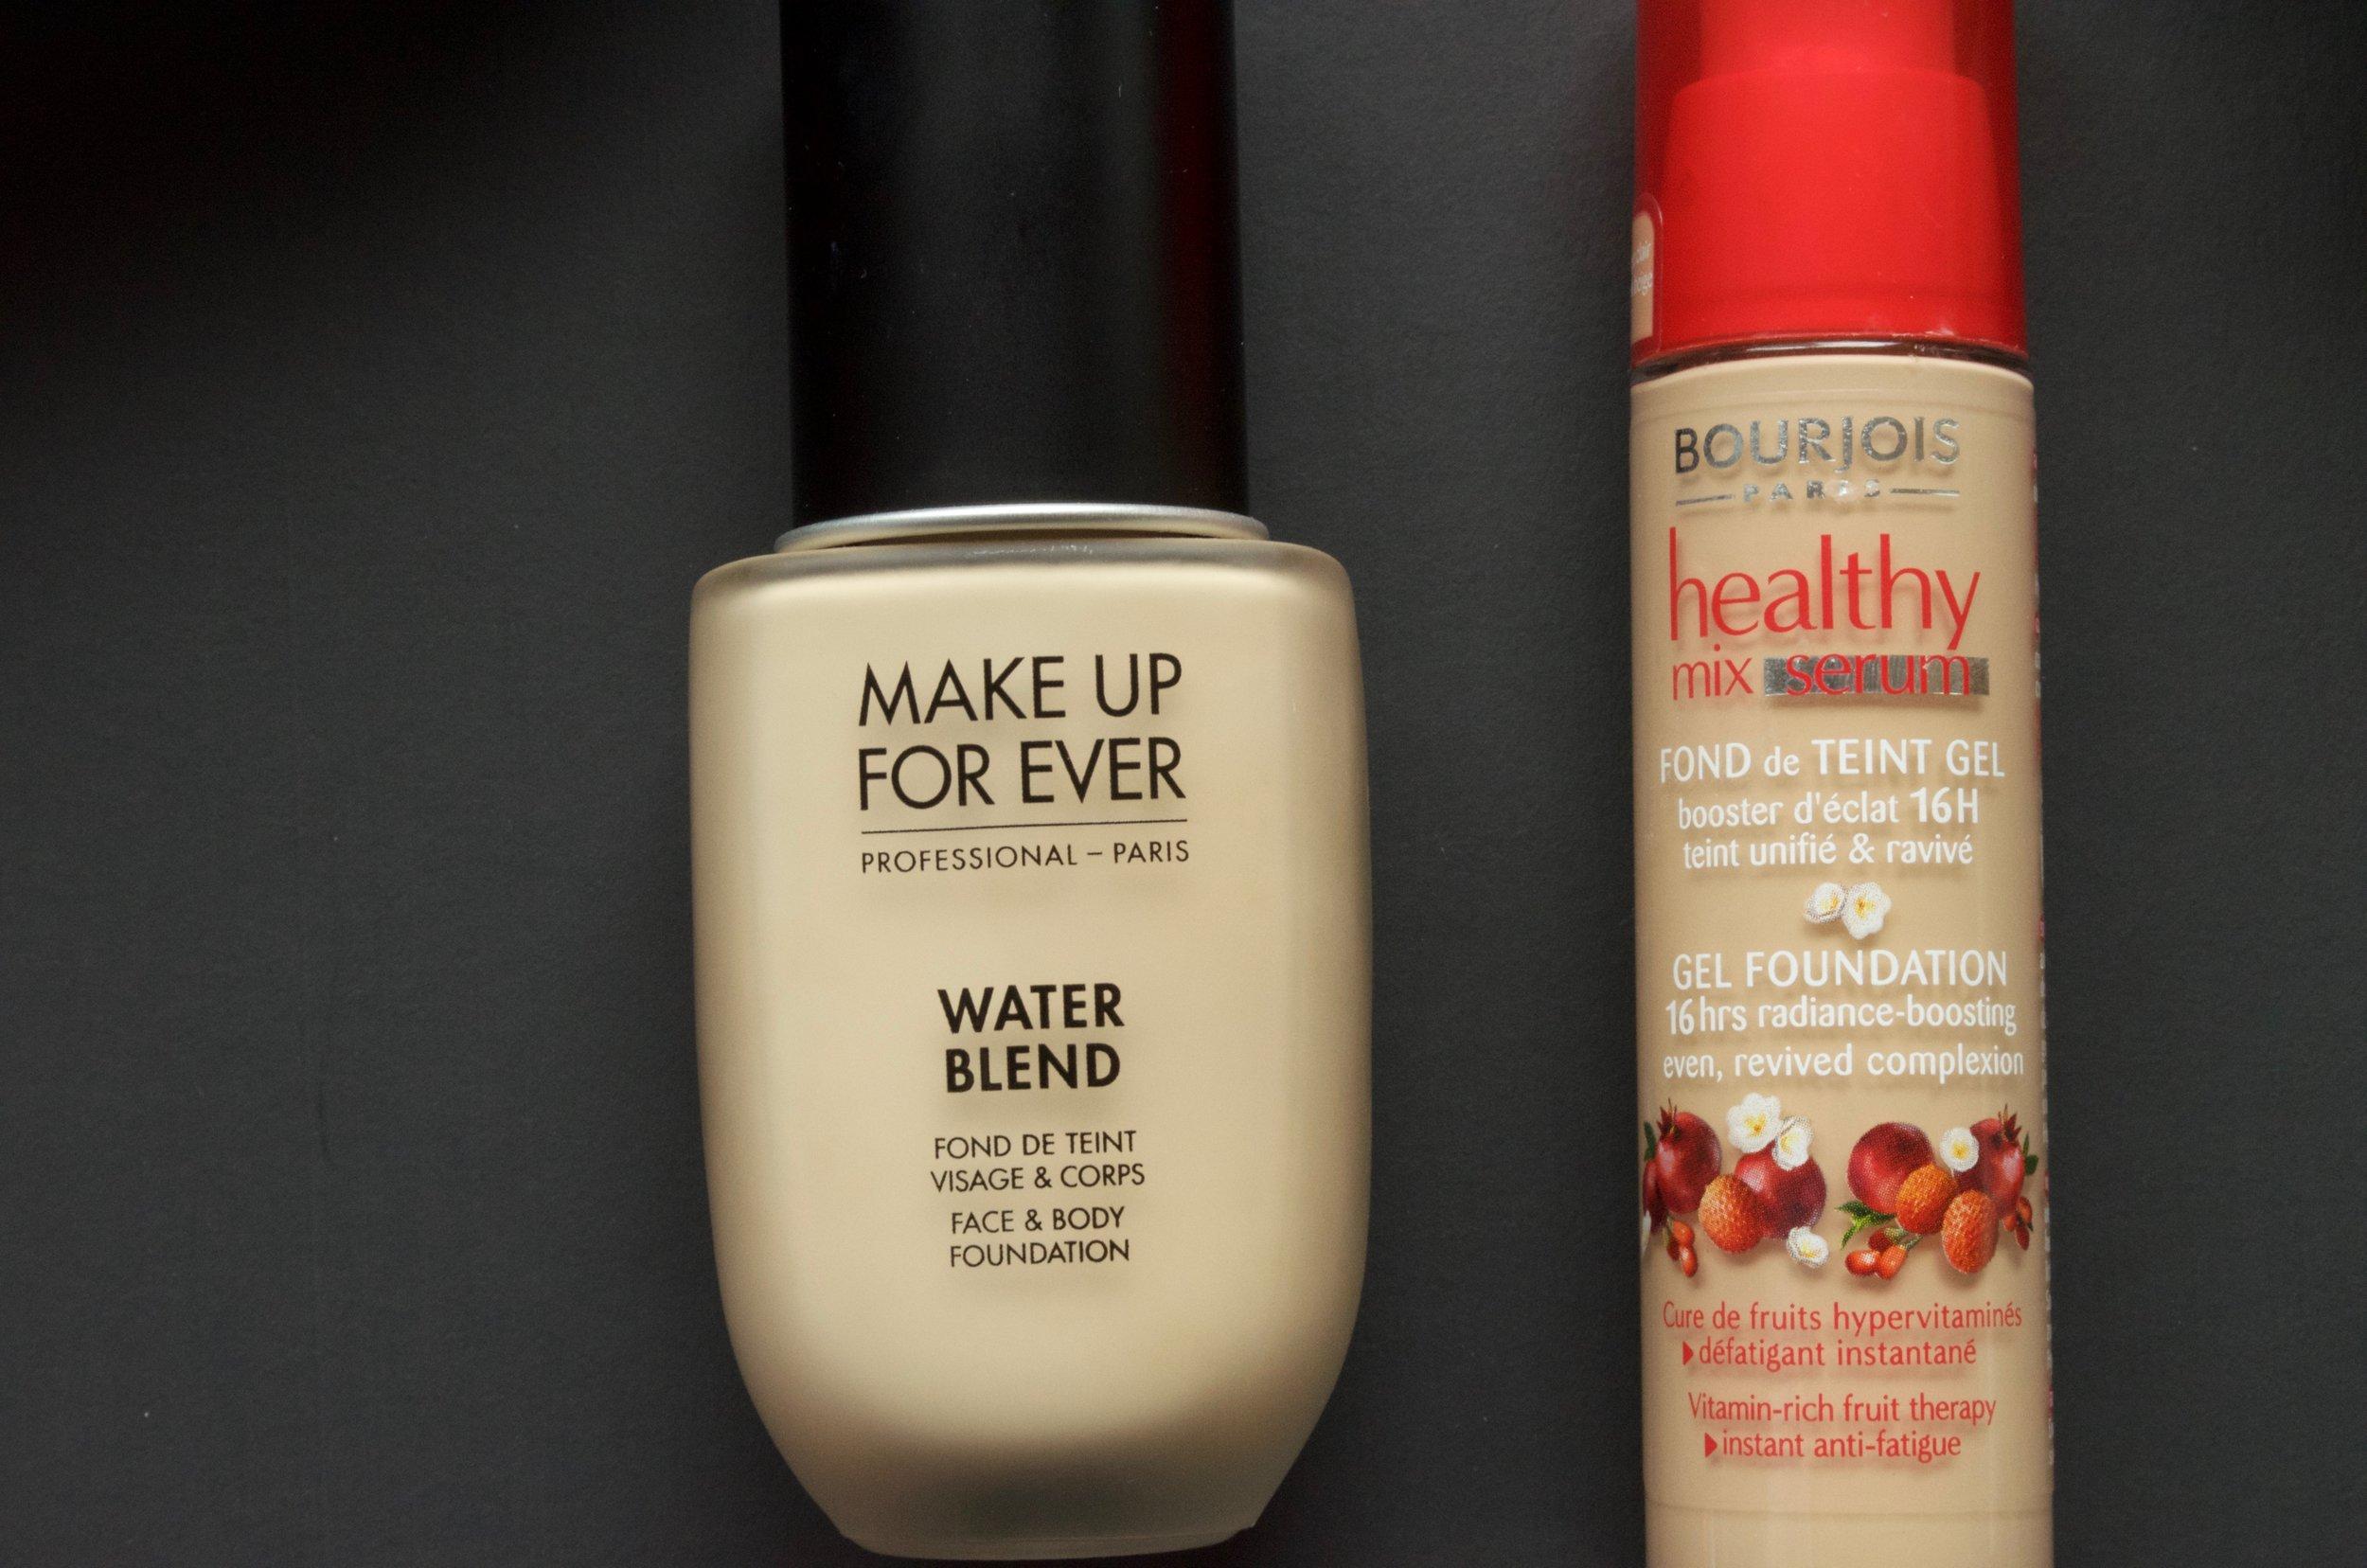 MUFE water blend vs. Bourjois Healthy Mix